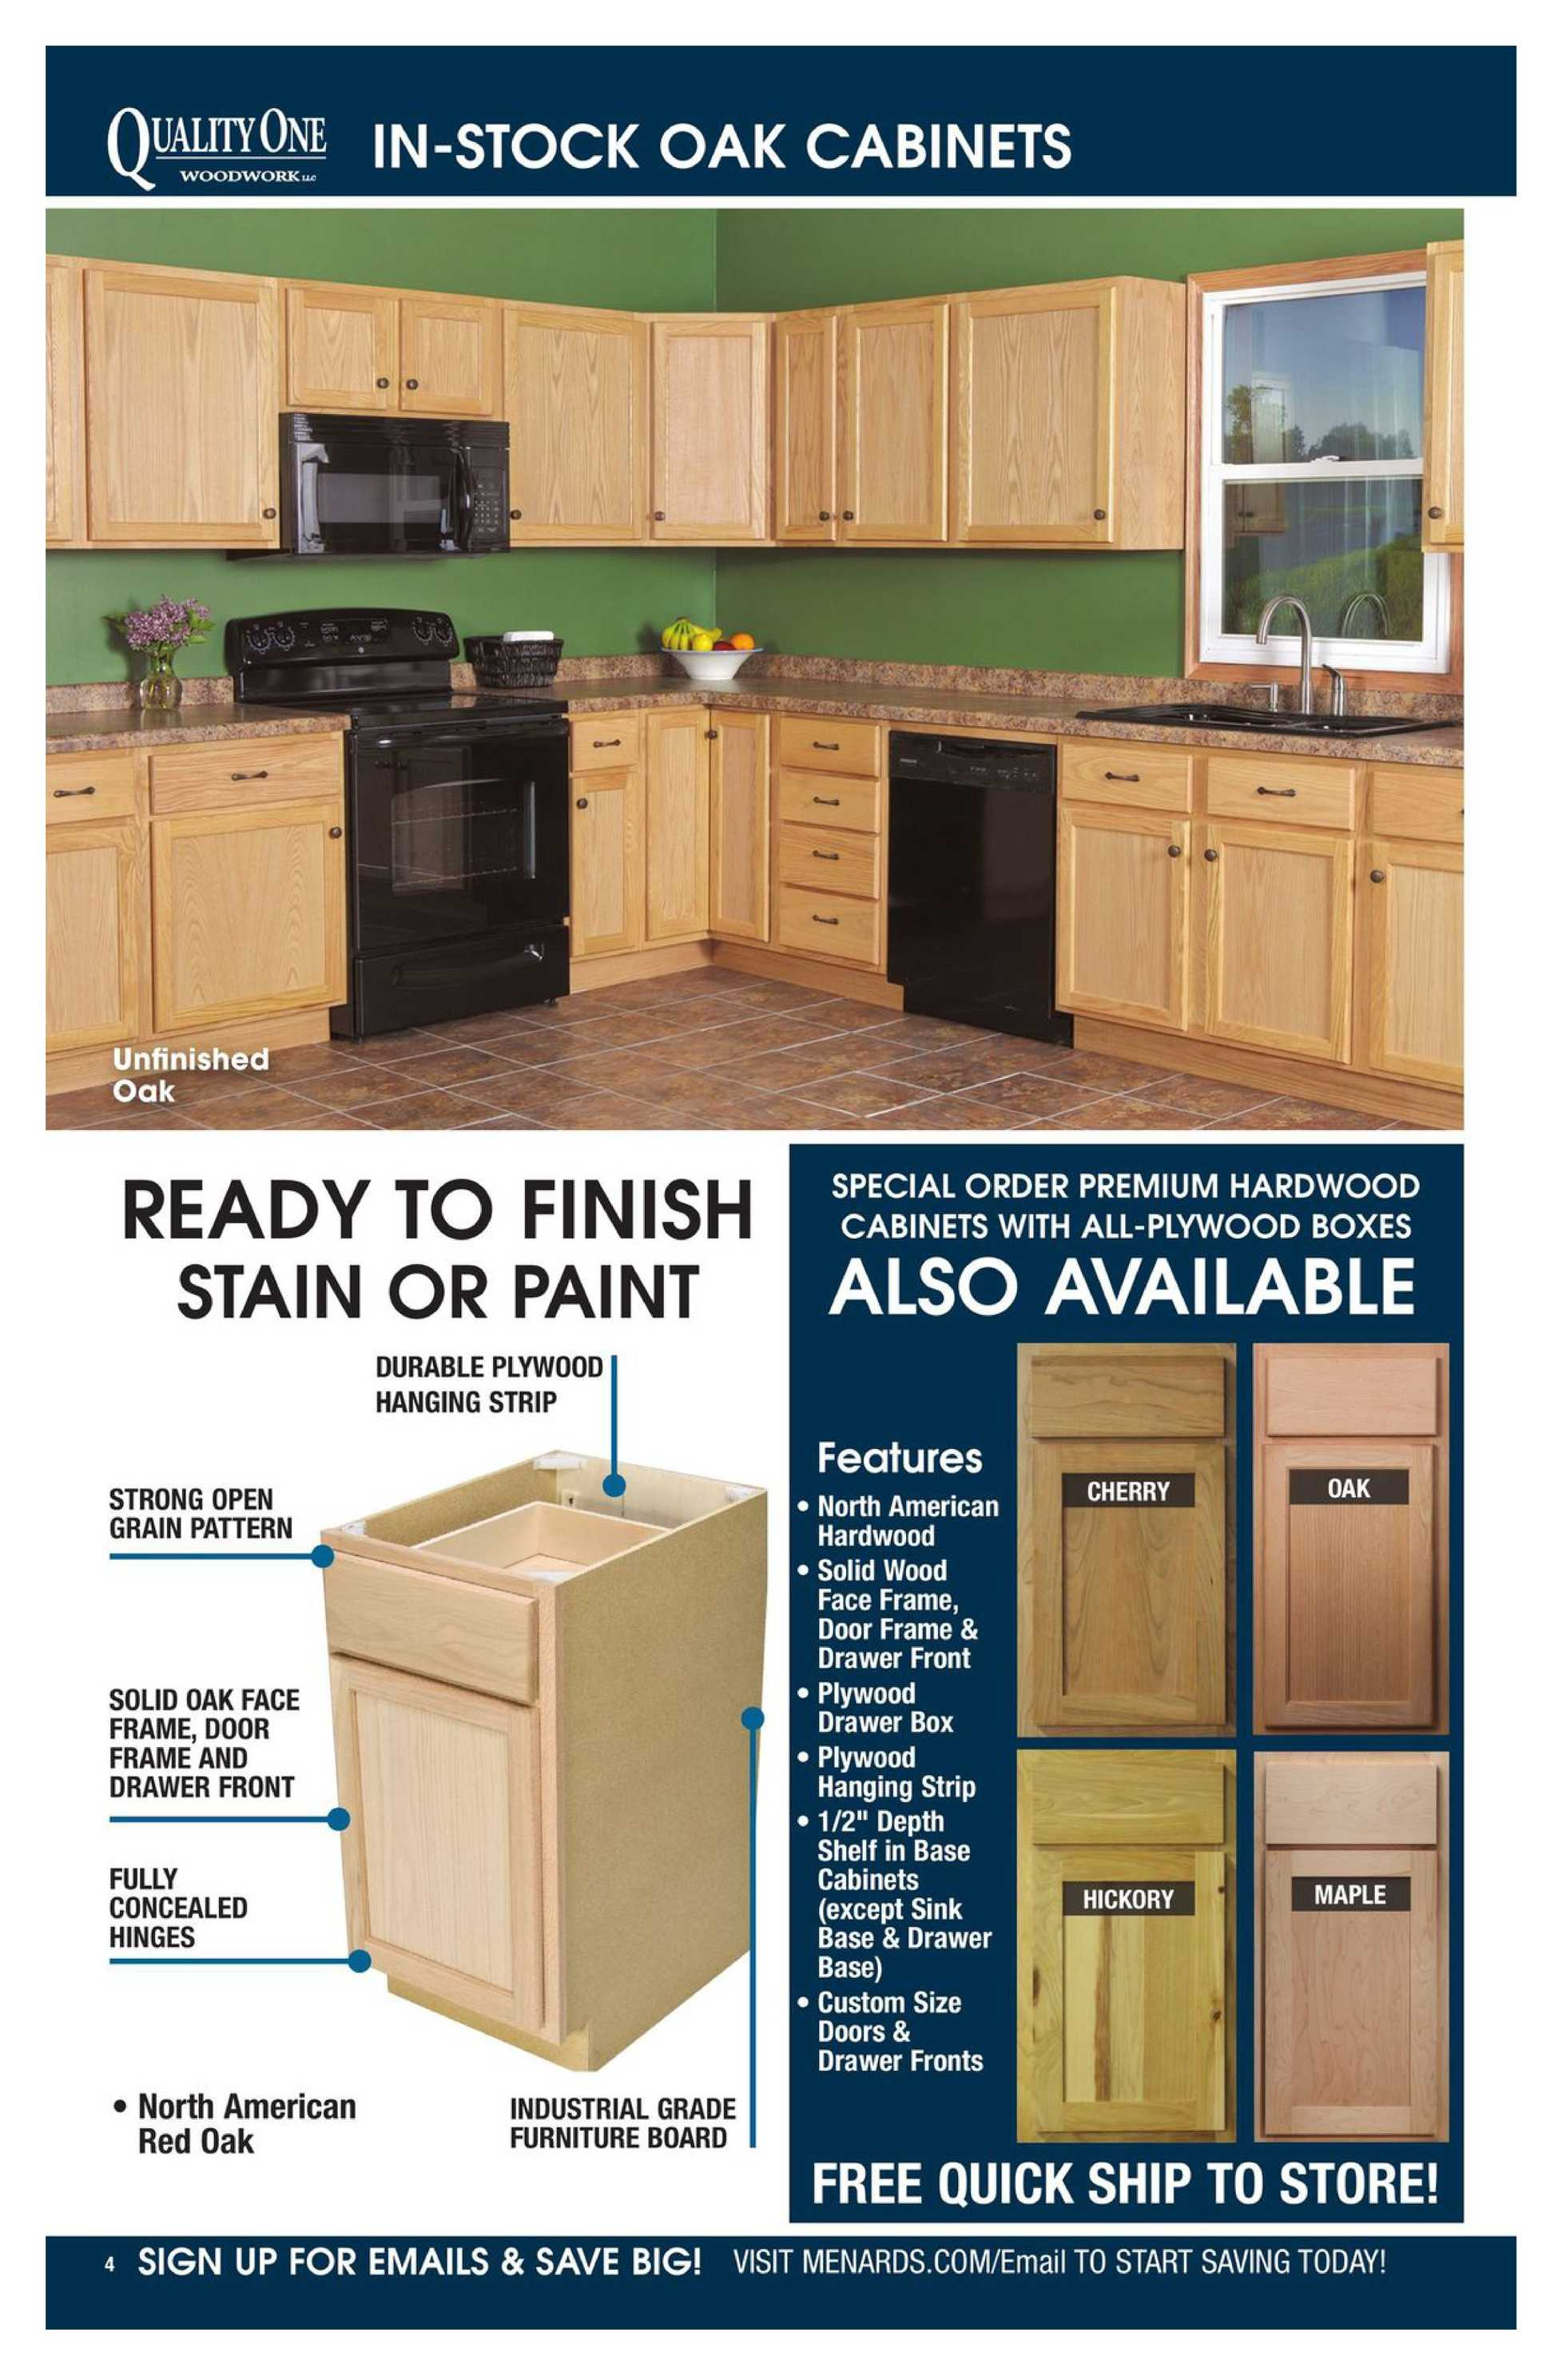 Menards Catalogue Kitchen 2019 2020 08 25 19 Us Promotons Com